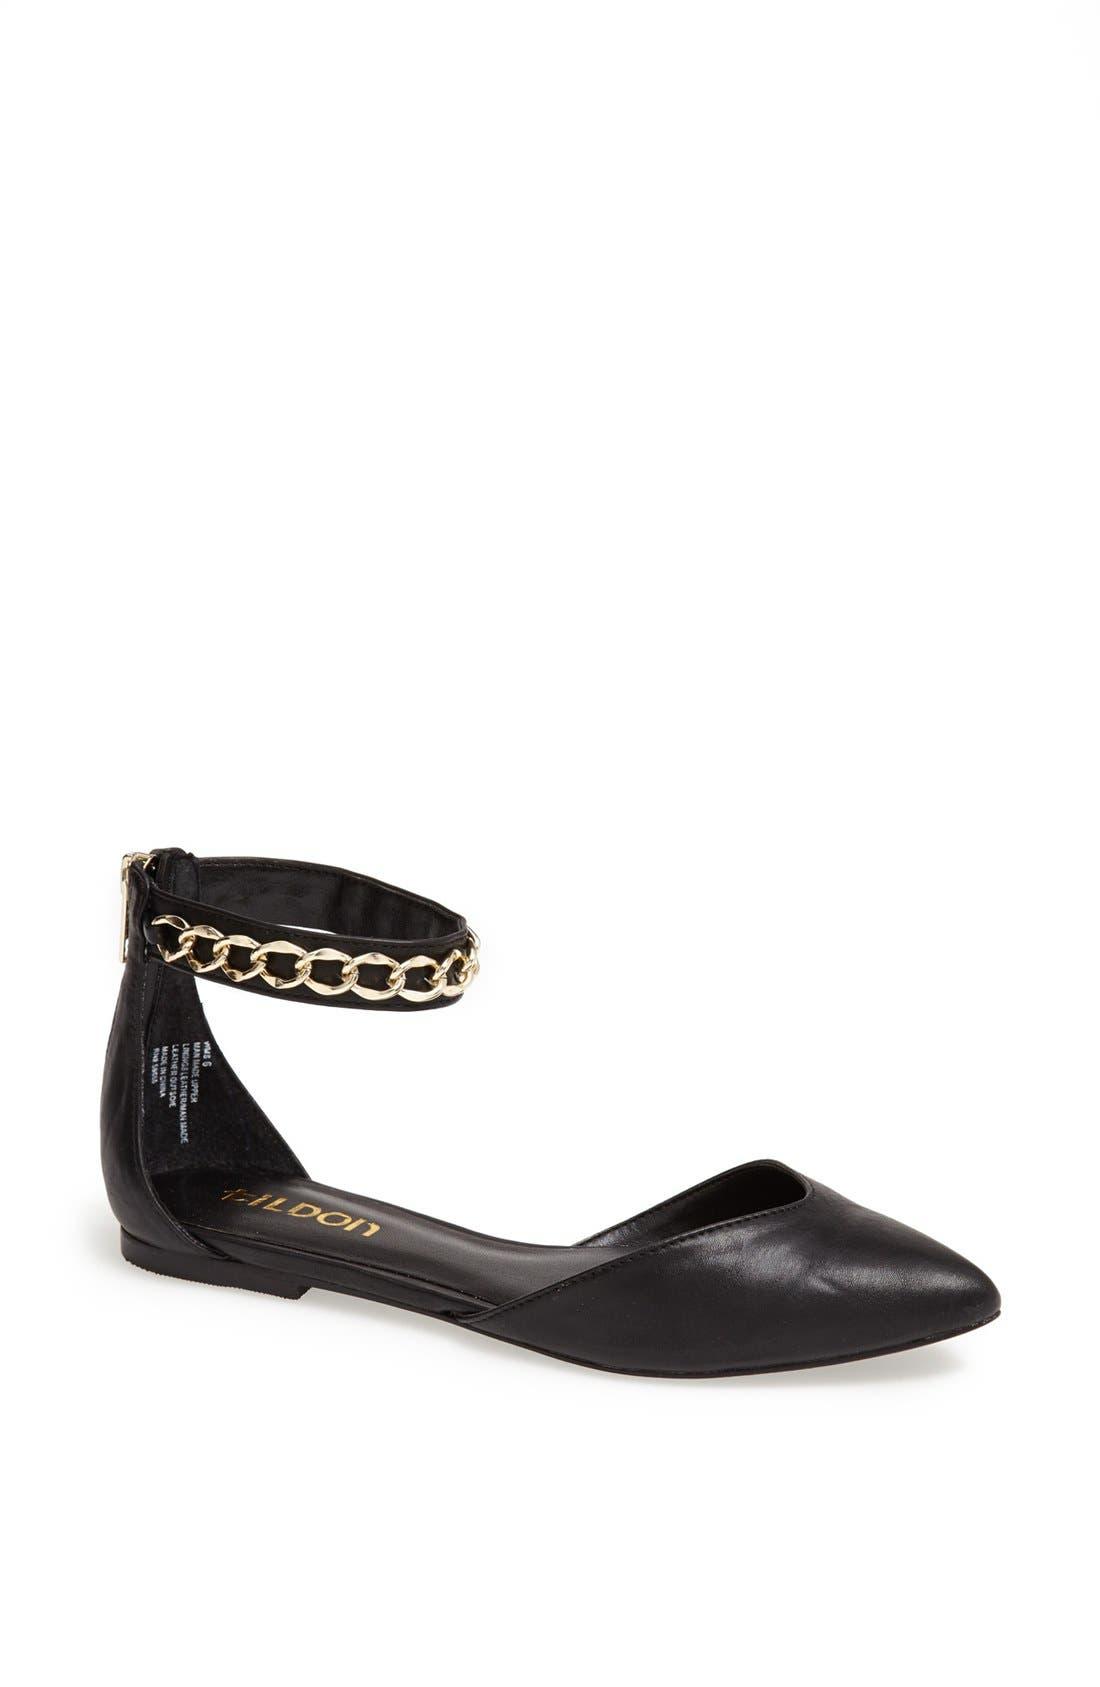 Main Image - Tildon 'Anya' Ankle Strap D'Orsay Flat